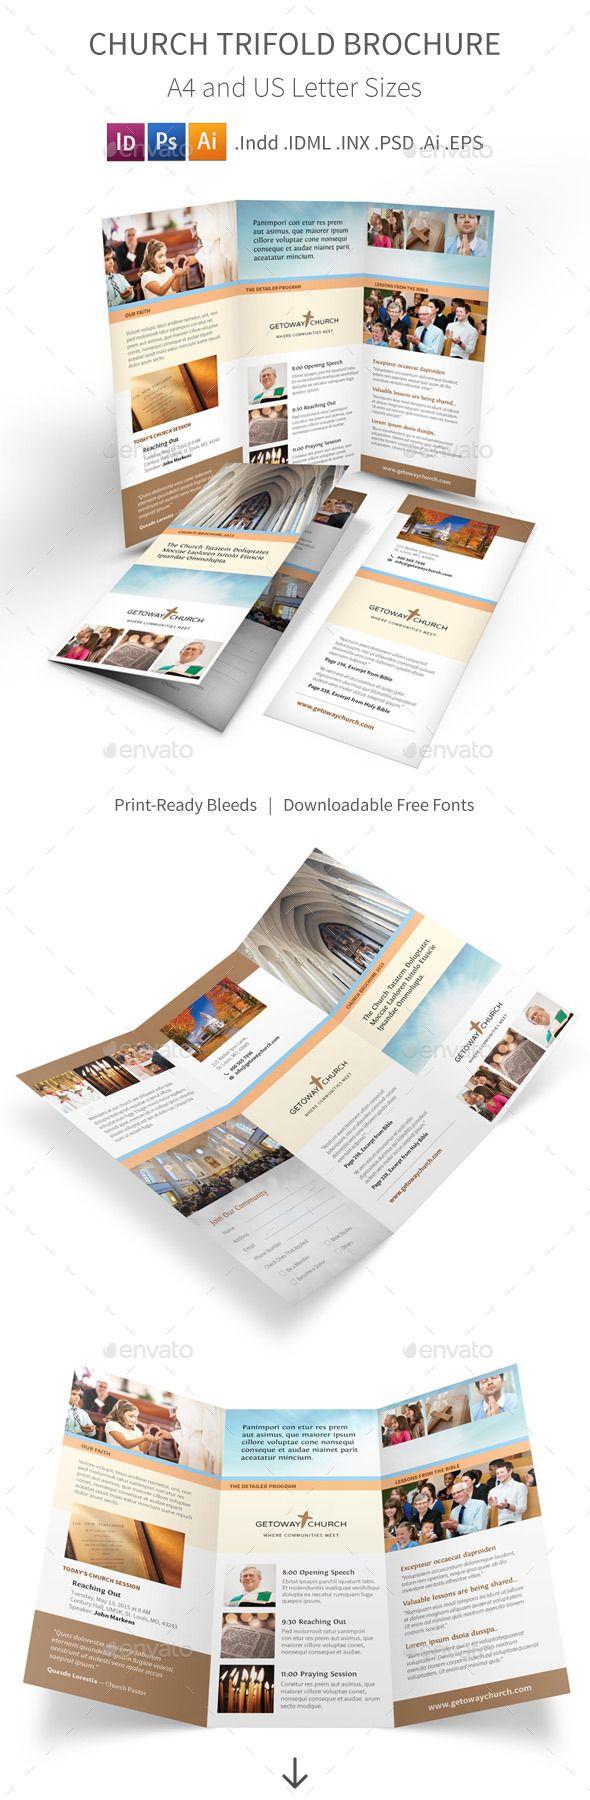 132 best images about church print social media ideas on pinterest newsletter templates. Black Bedroom Furniture Sets. Home Design Ideas